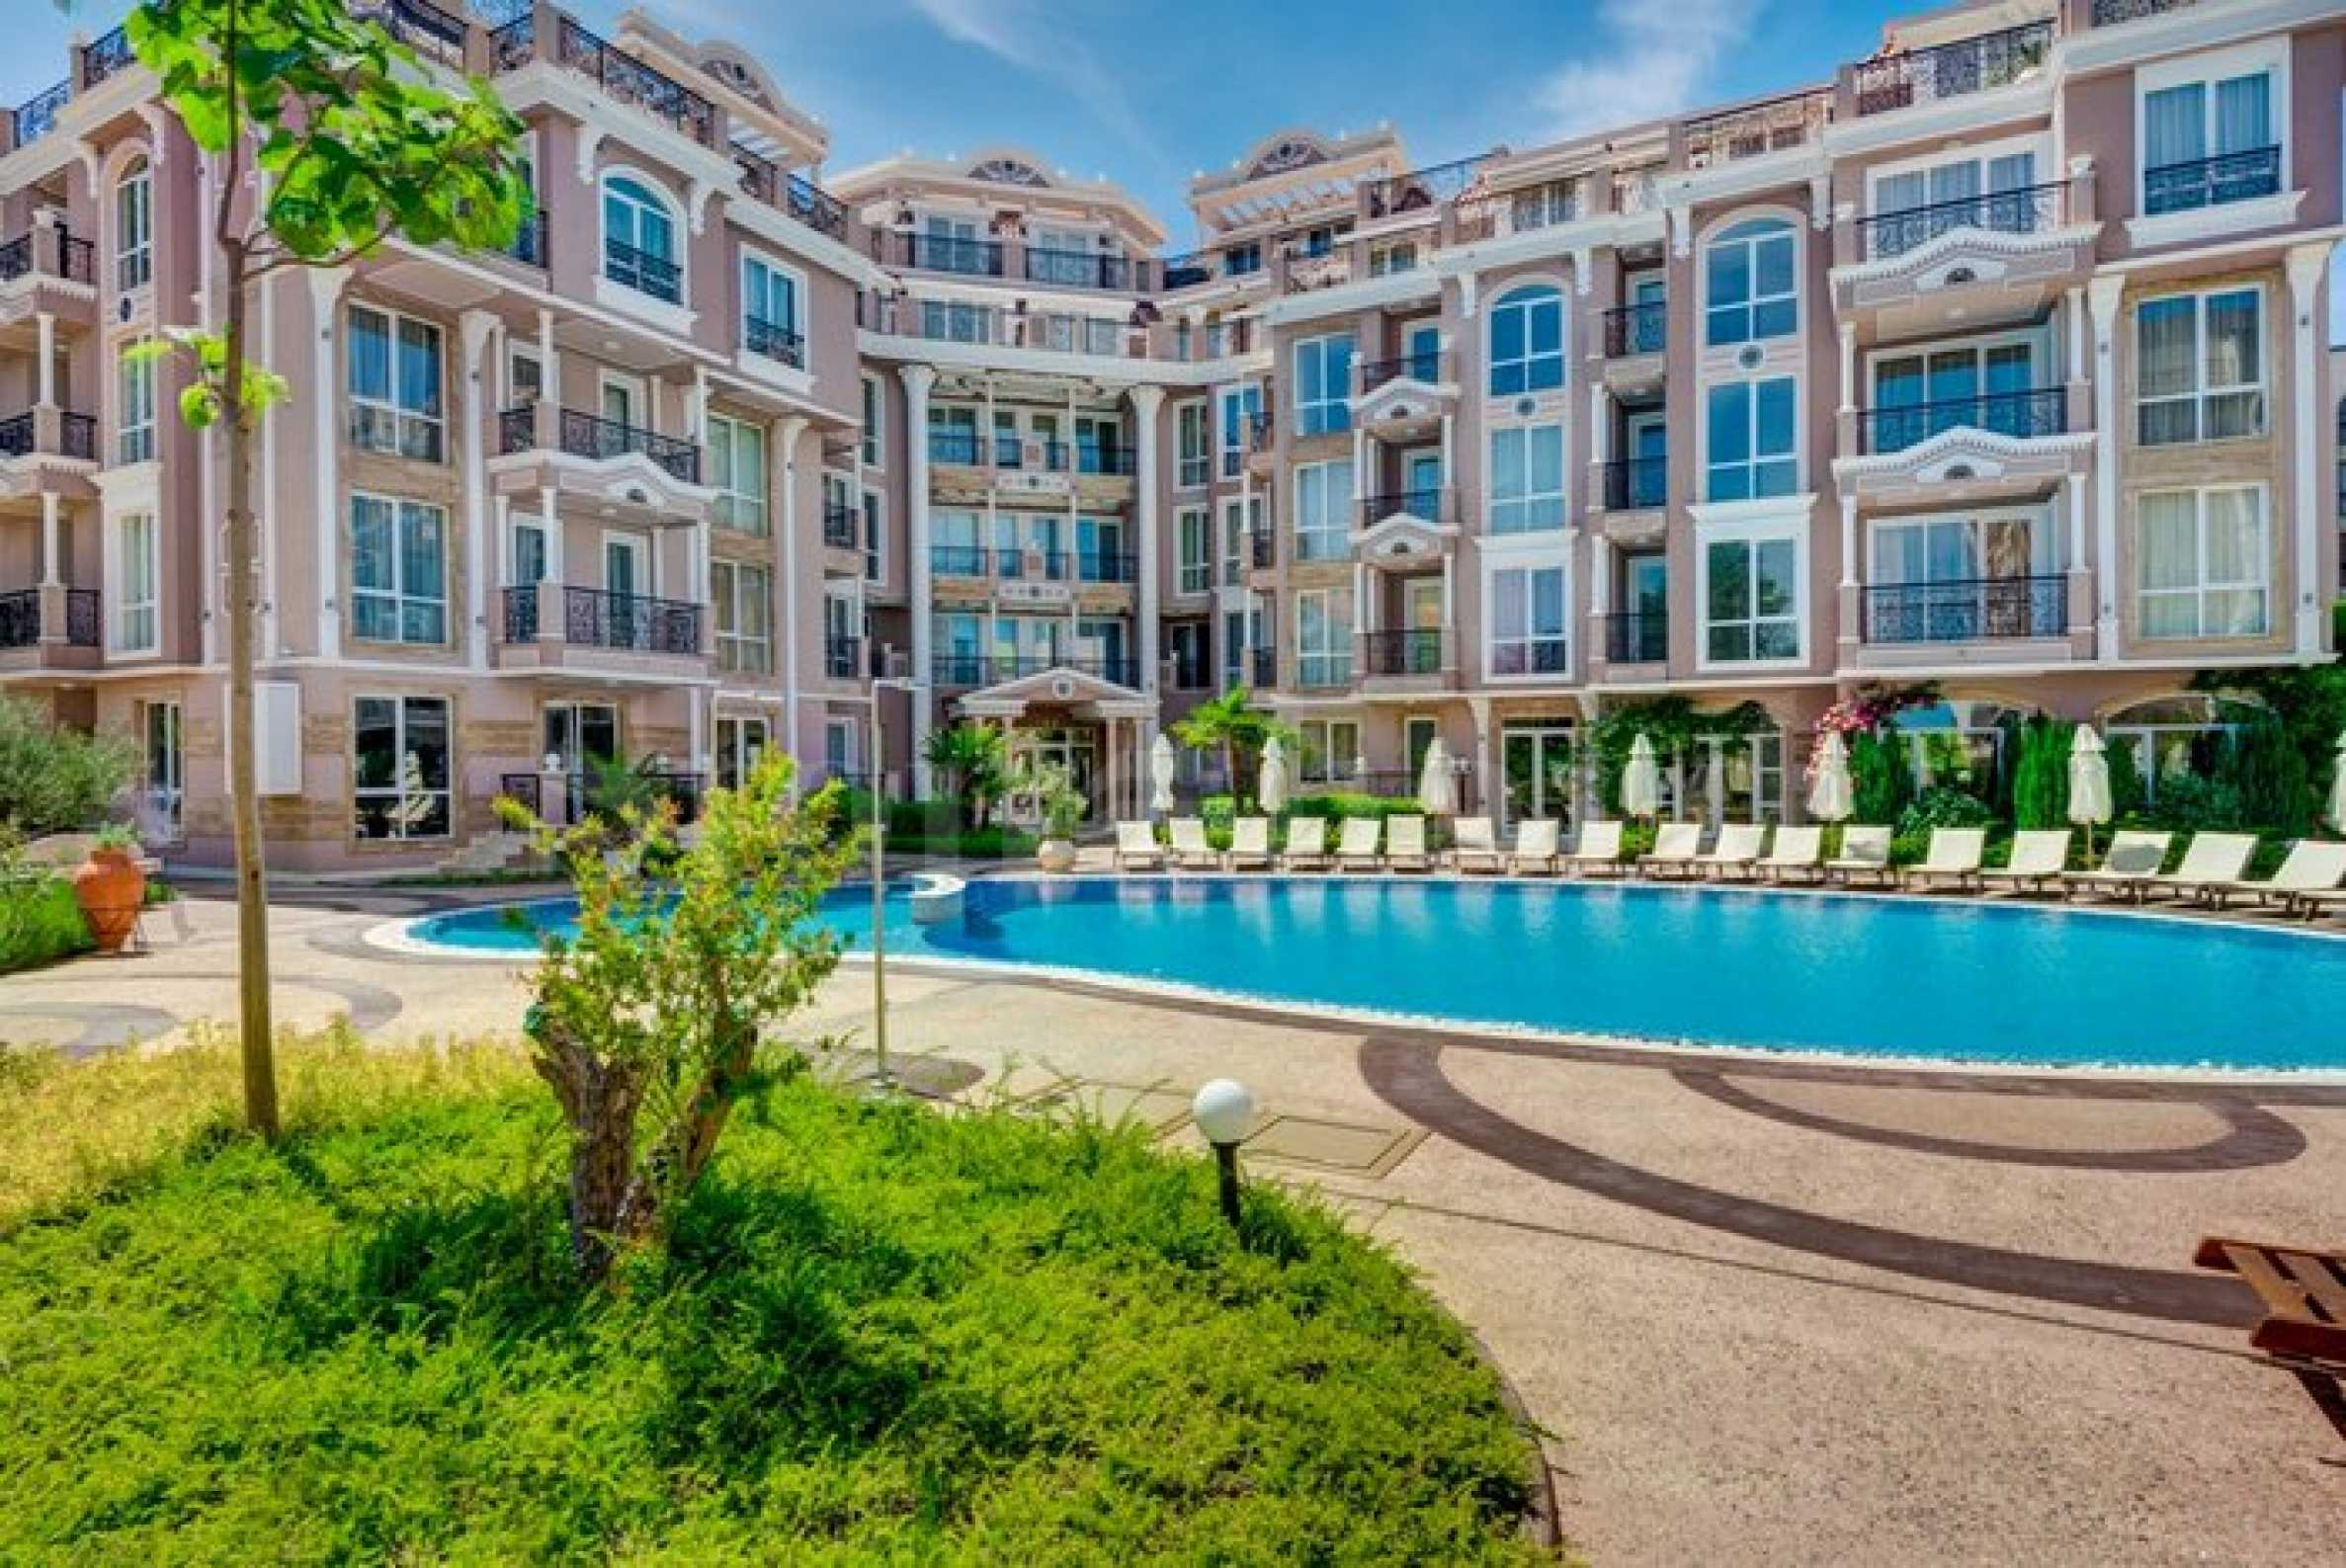 Апартаменти в разкошен комплекс с много удобства, к.к. Слънчев бряг1 - Stonehard